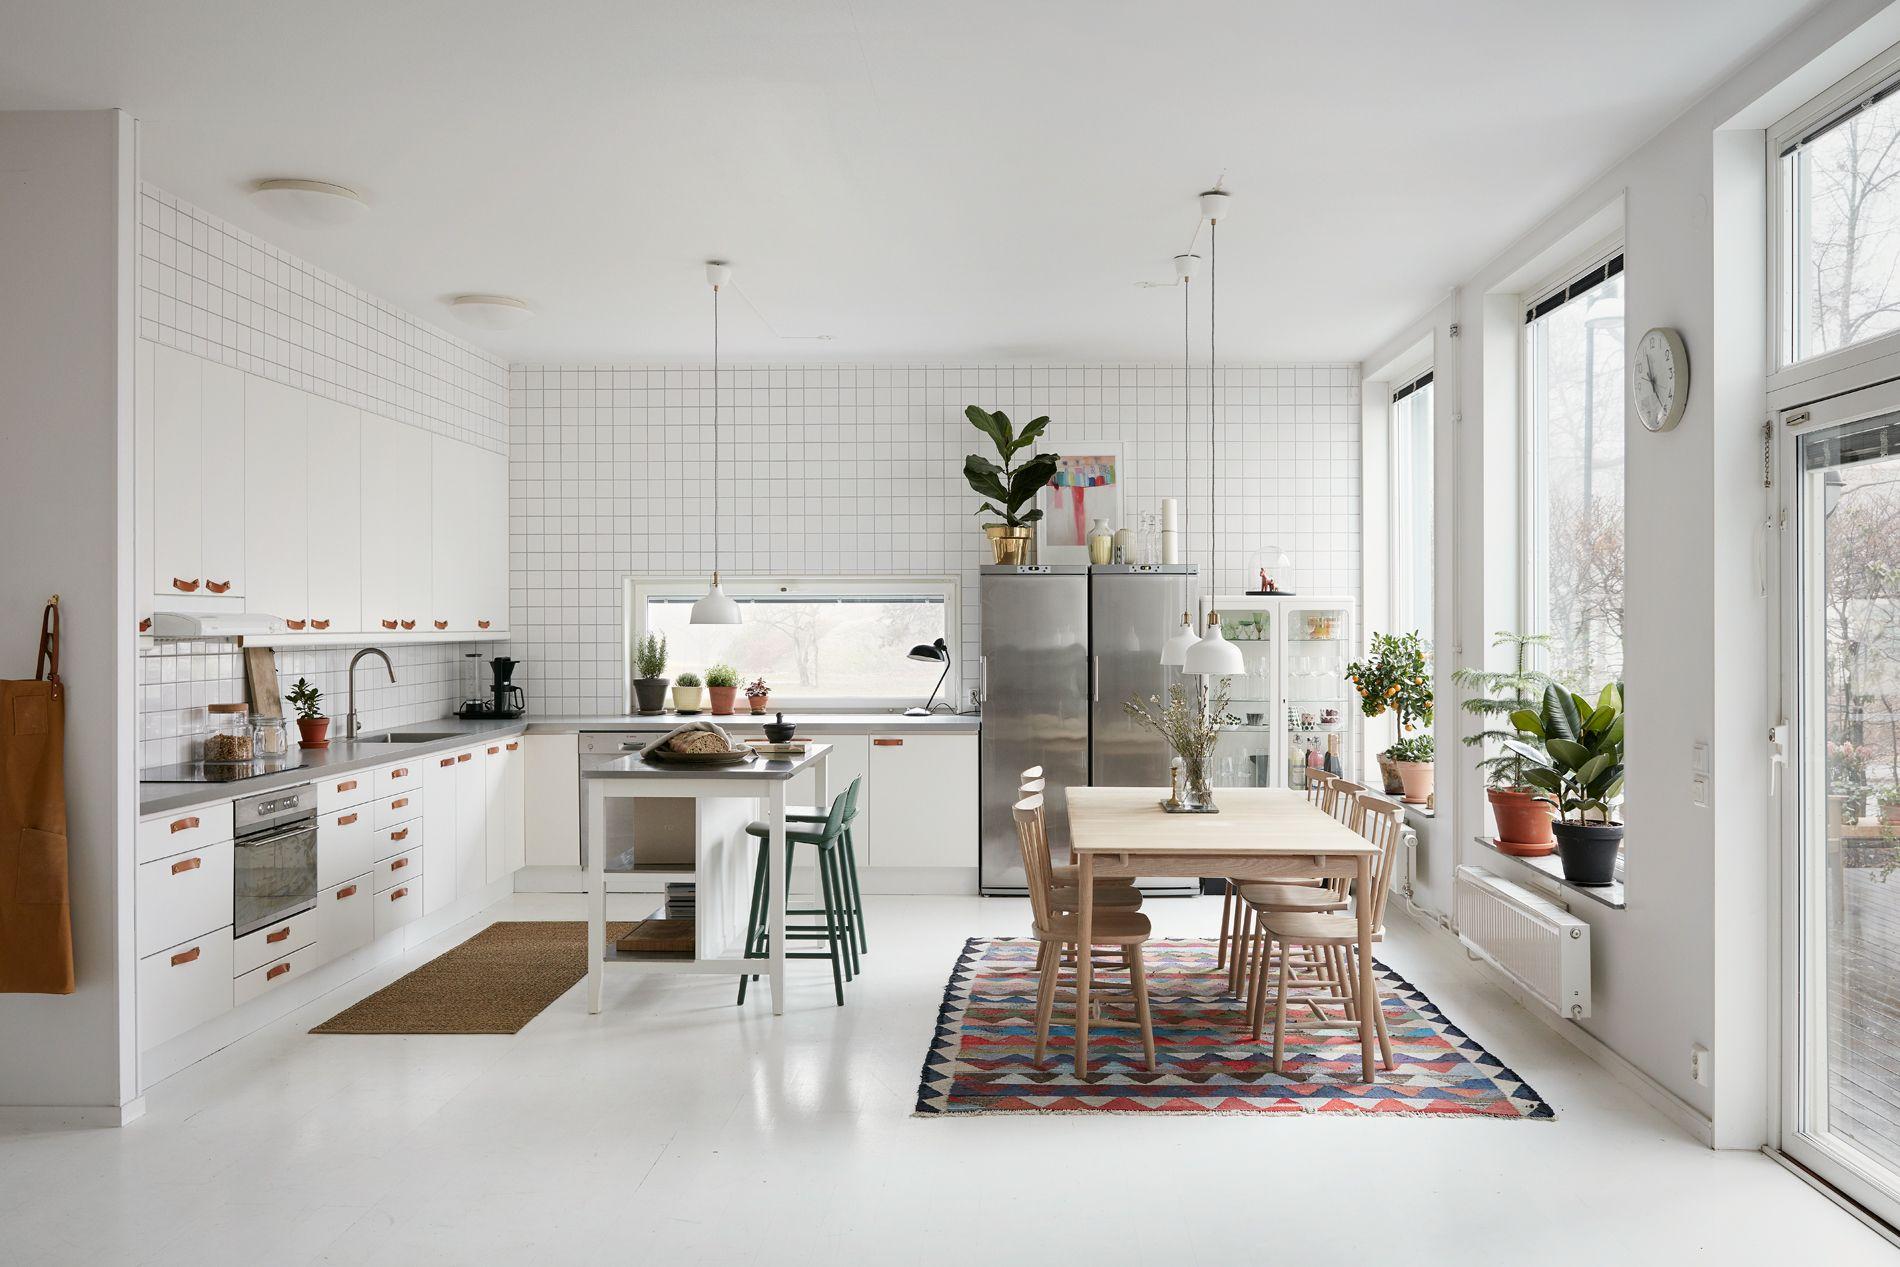 kitchen, Älvsjö, Stockholm   Fantastic Frank   Envies déco   Pinterest